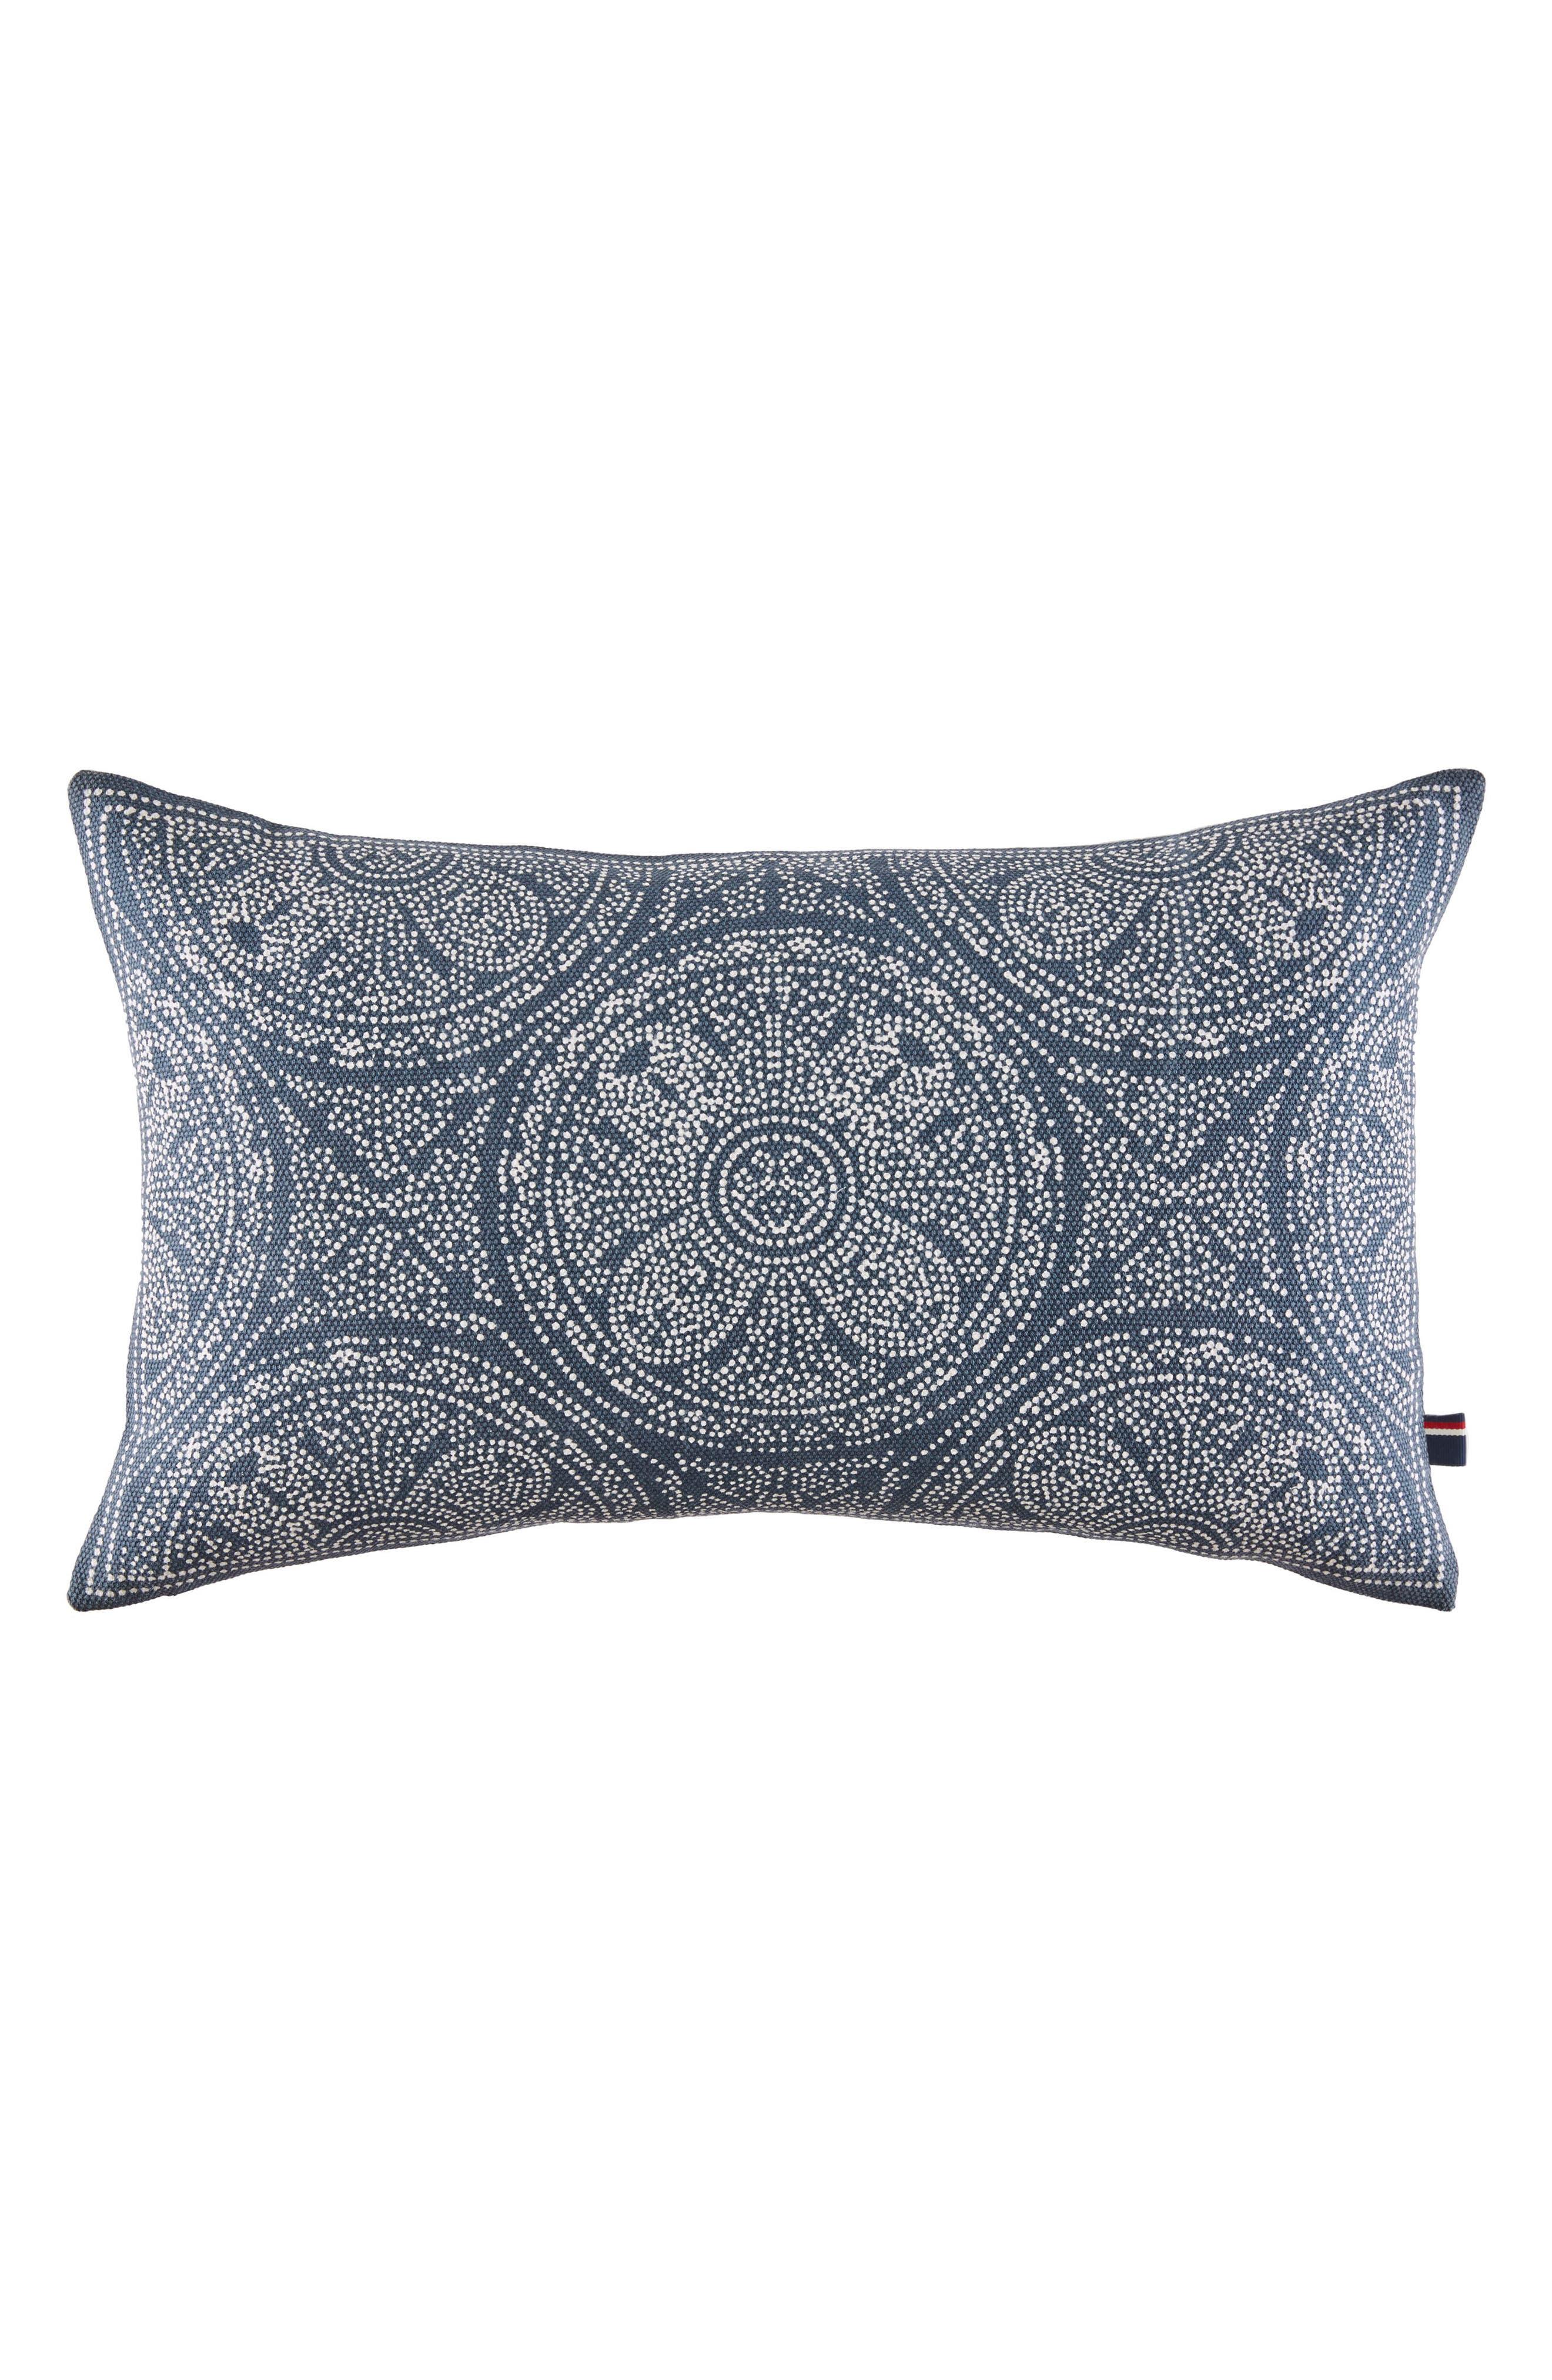 Main Image - Tommy Hilfiger Batik Indigo Accent Pillow